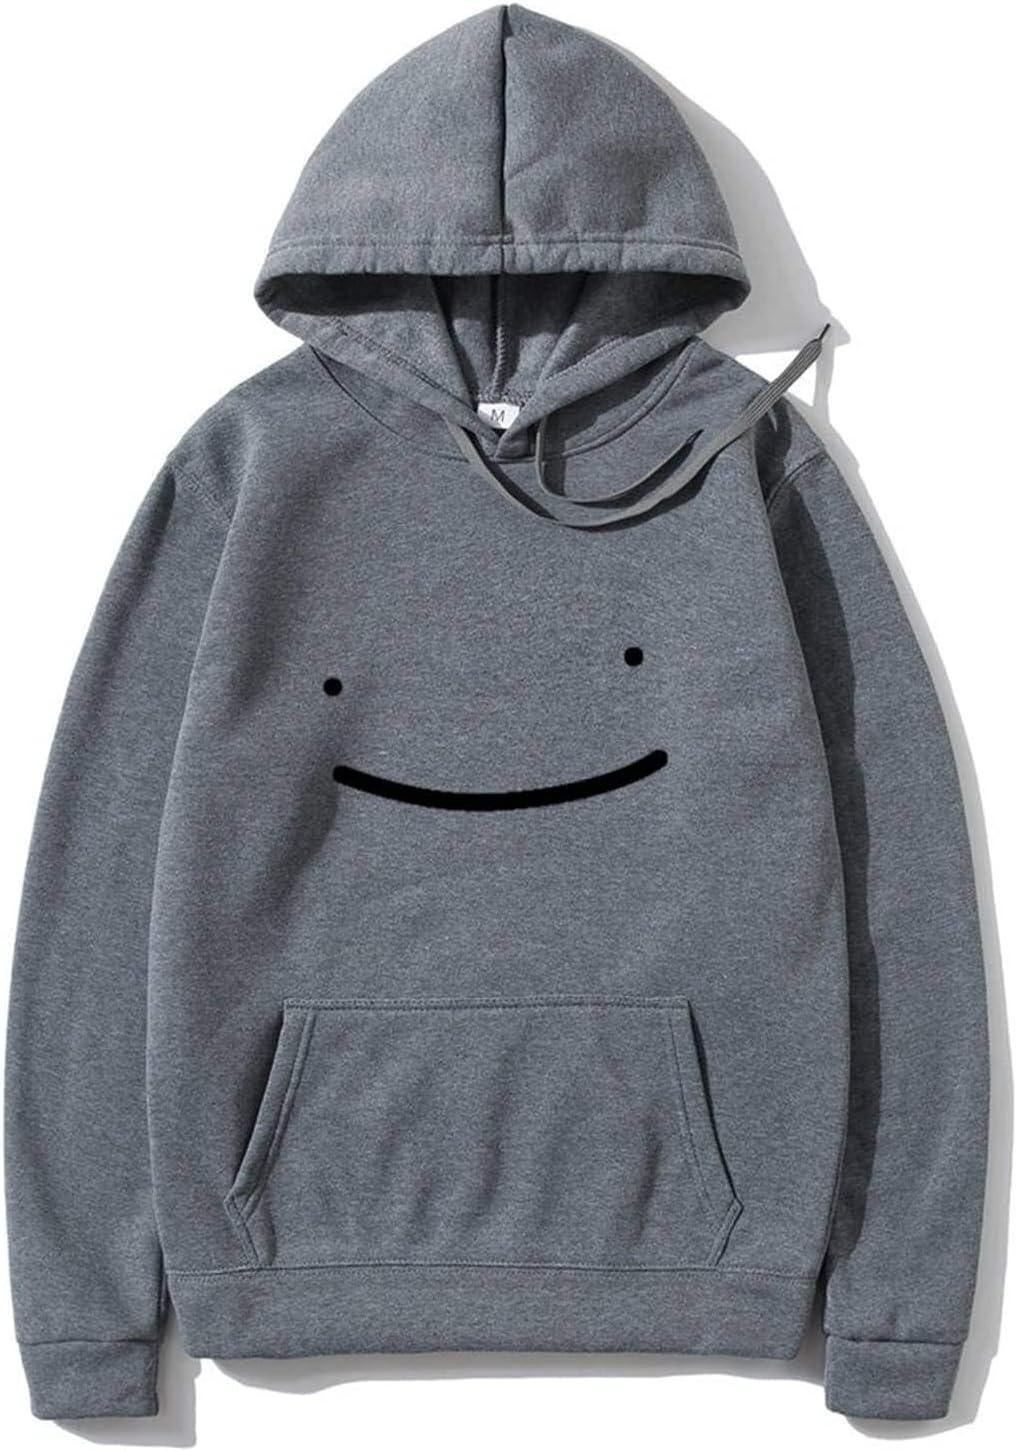 MAORR Cartoon Hooded Sweater, Moletom Com Capuz Moletom Masculino Feminino Harajuku Pullover Moletom Streetwear Moda Casual Roupas Grandes (Color : 18, Size : -XXXL)